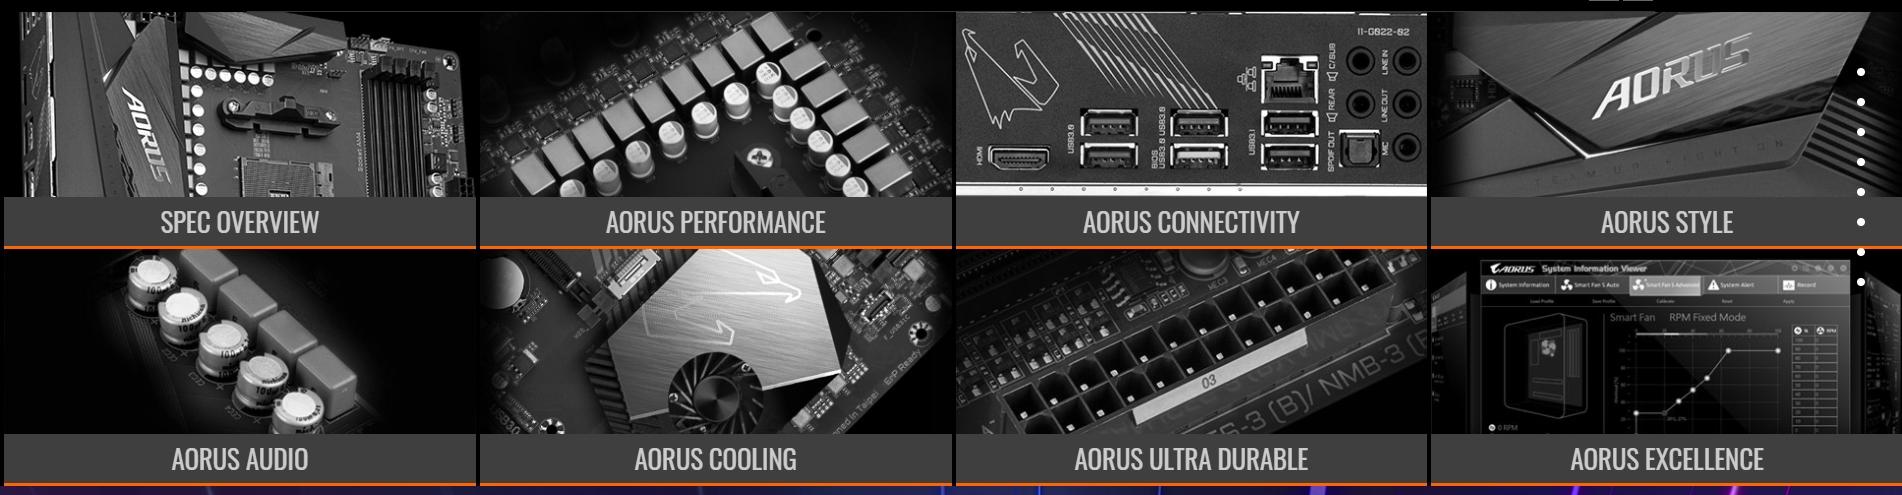 Gigabyte AMD X570 AORUS Elite Motherboard, Dual PCIe 4 0 M 2 with Single  Thermal Guard, Intel GbE L